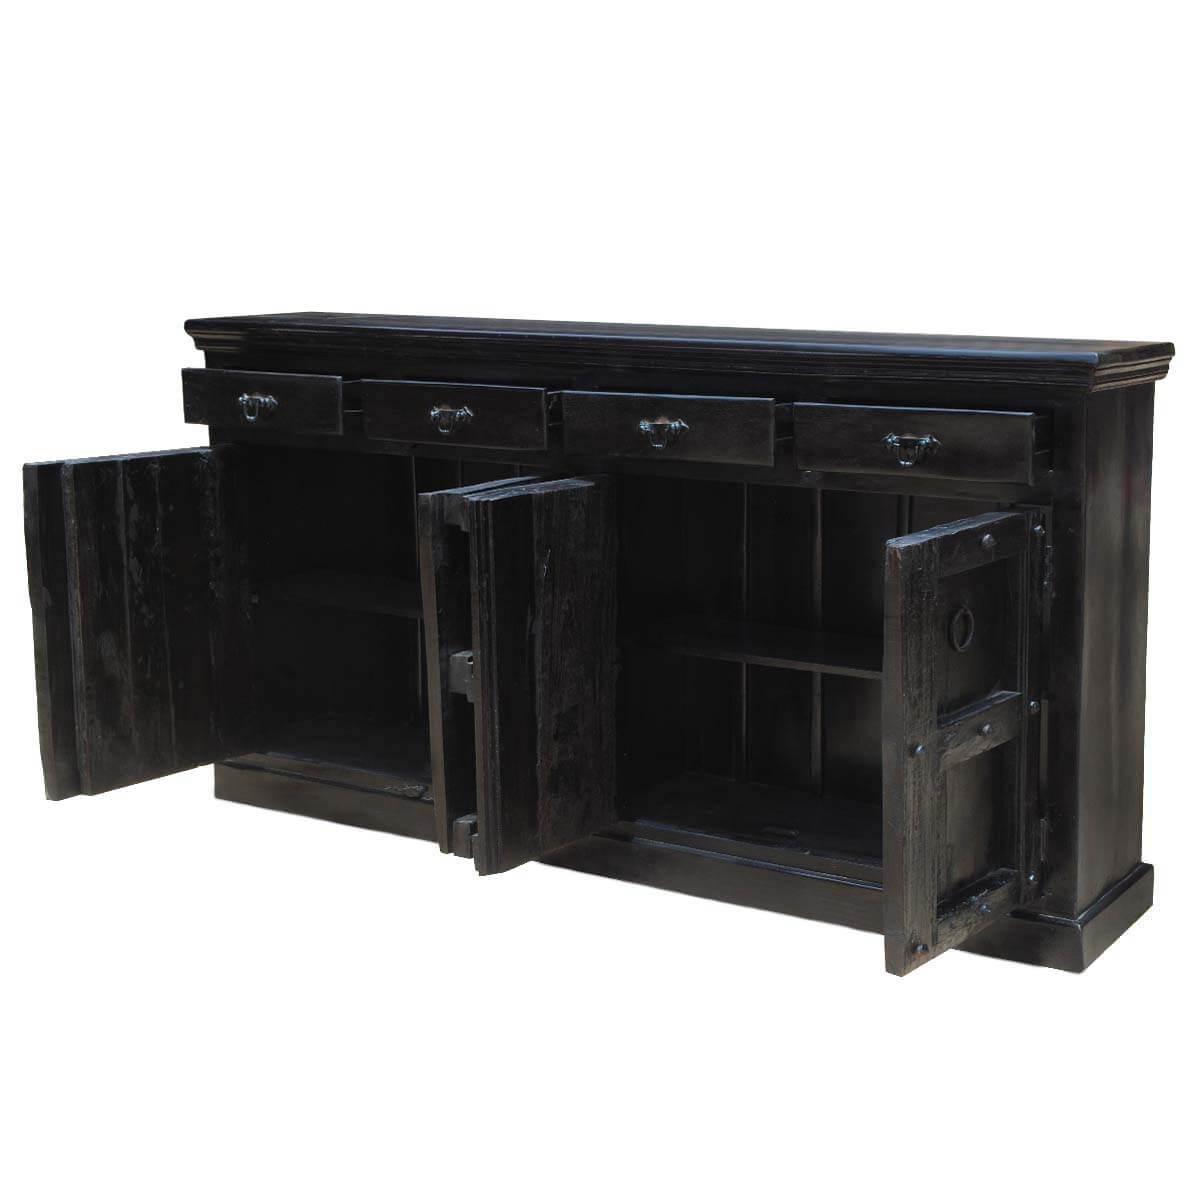 Wood Kansas City Black Buffet Cabinet Sideboard